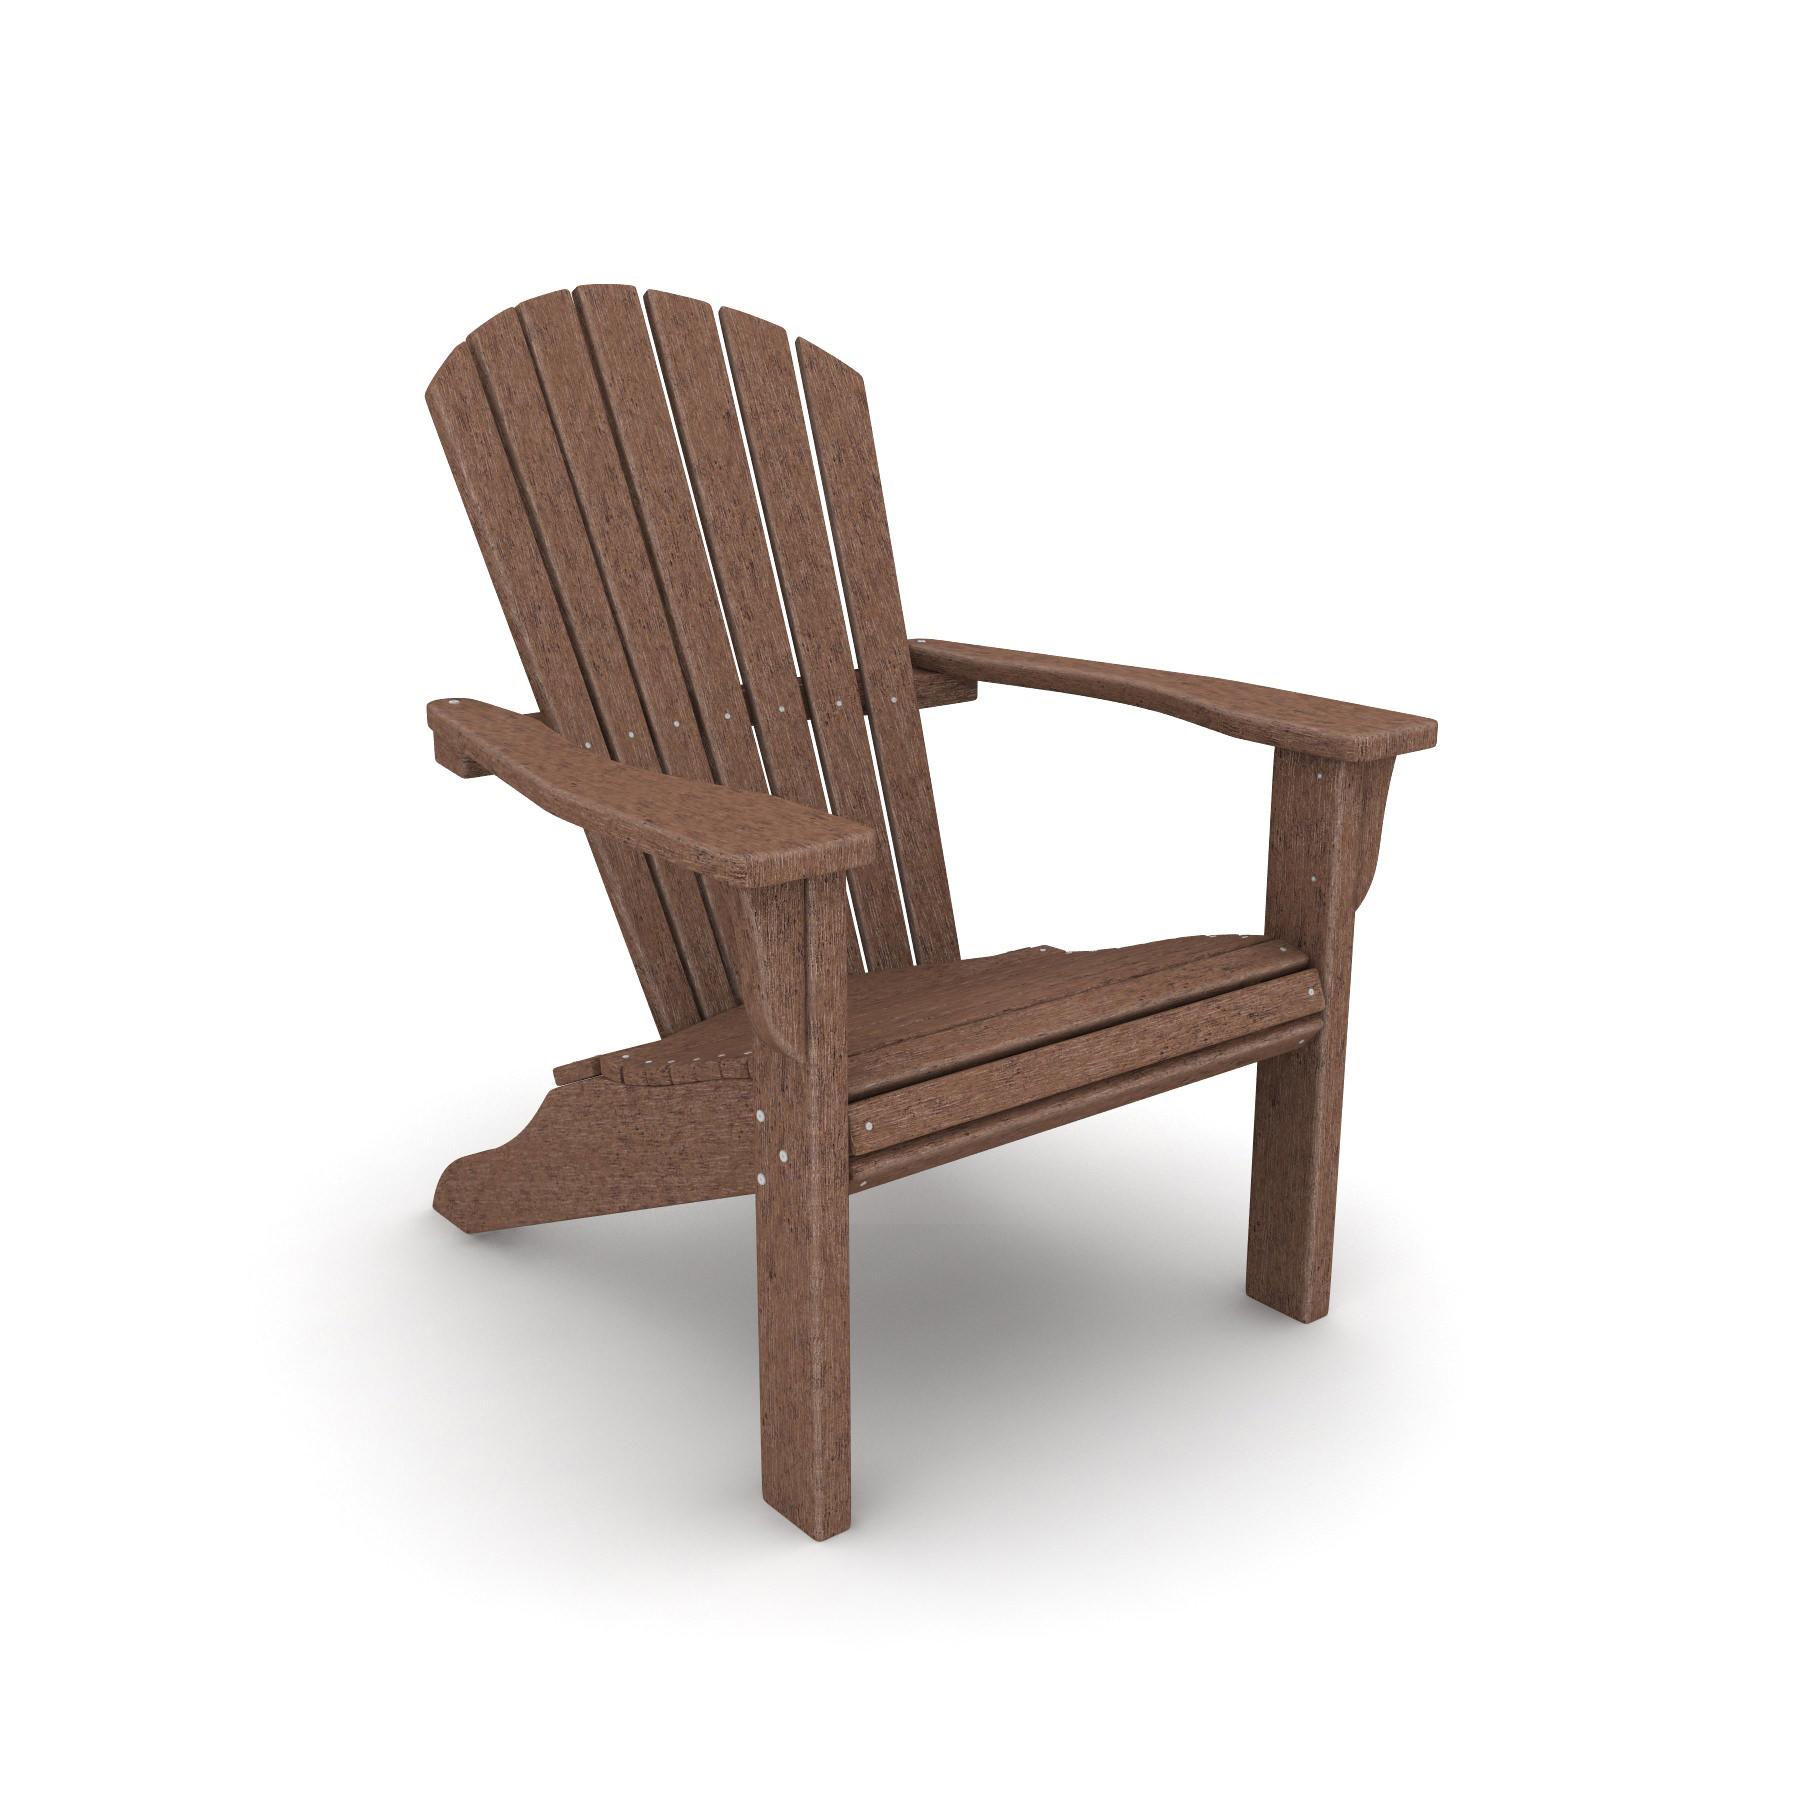 Buy Loggerhead Original Adirondack Chair Premium Poly Patios